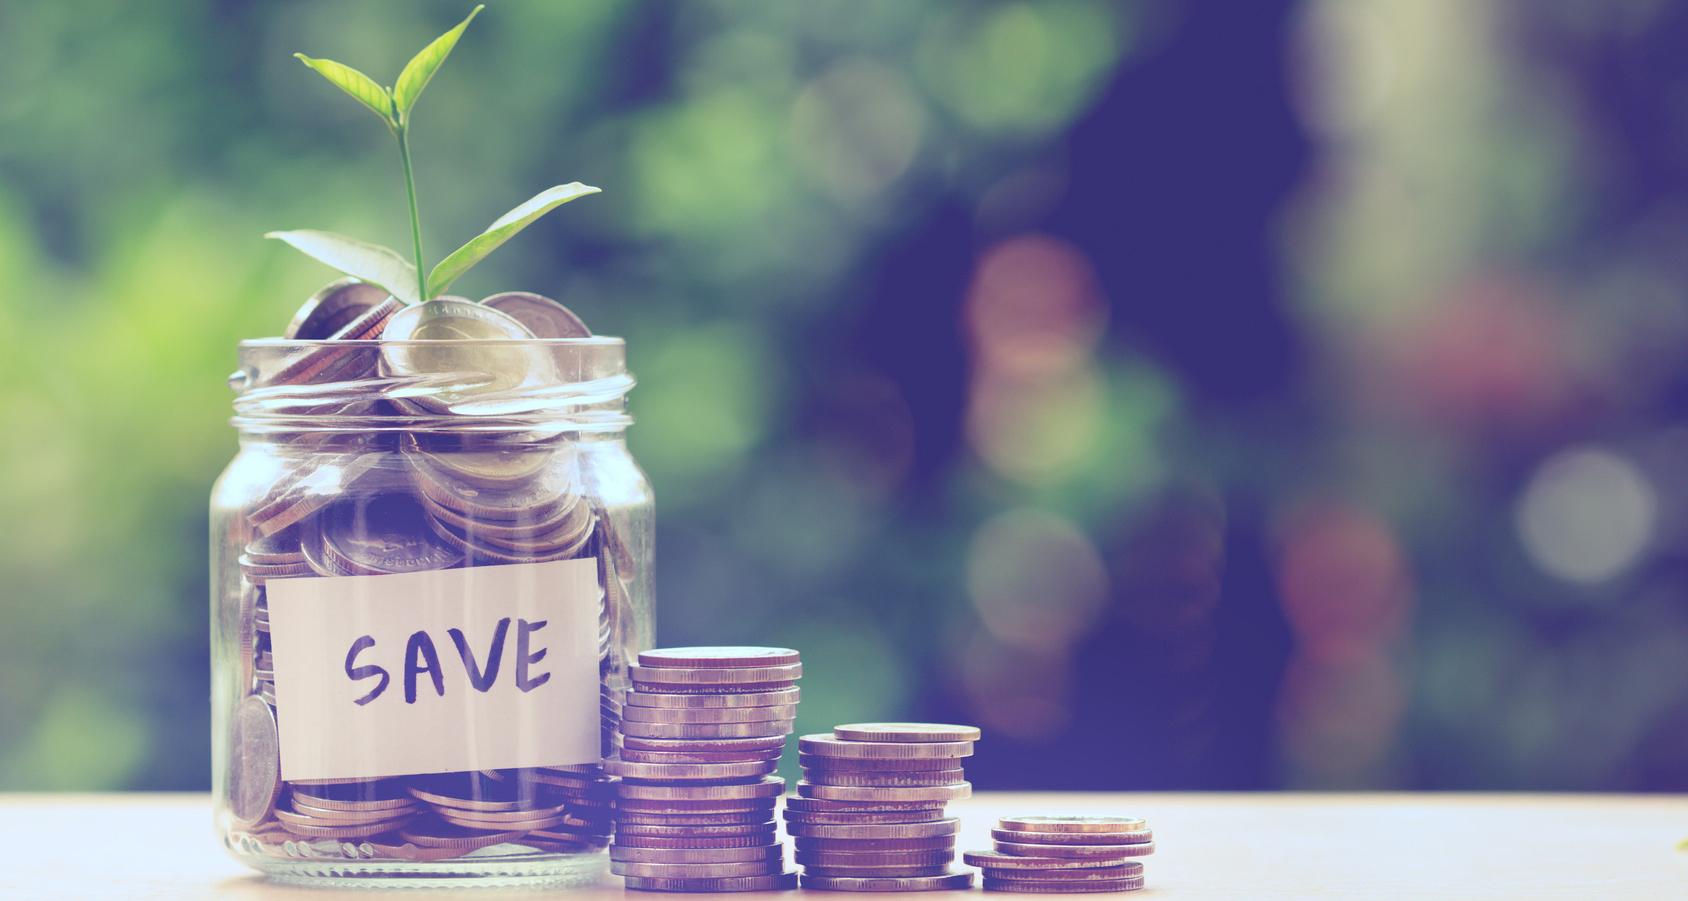 save money with BPC